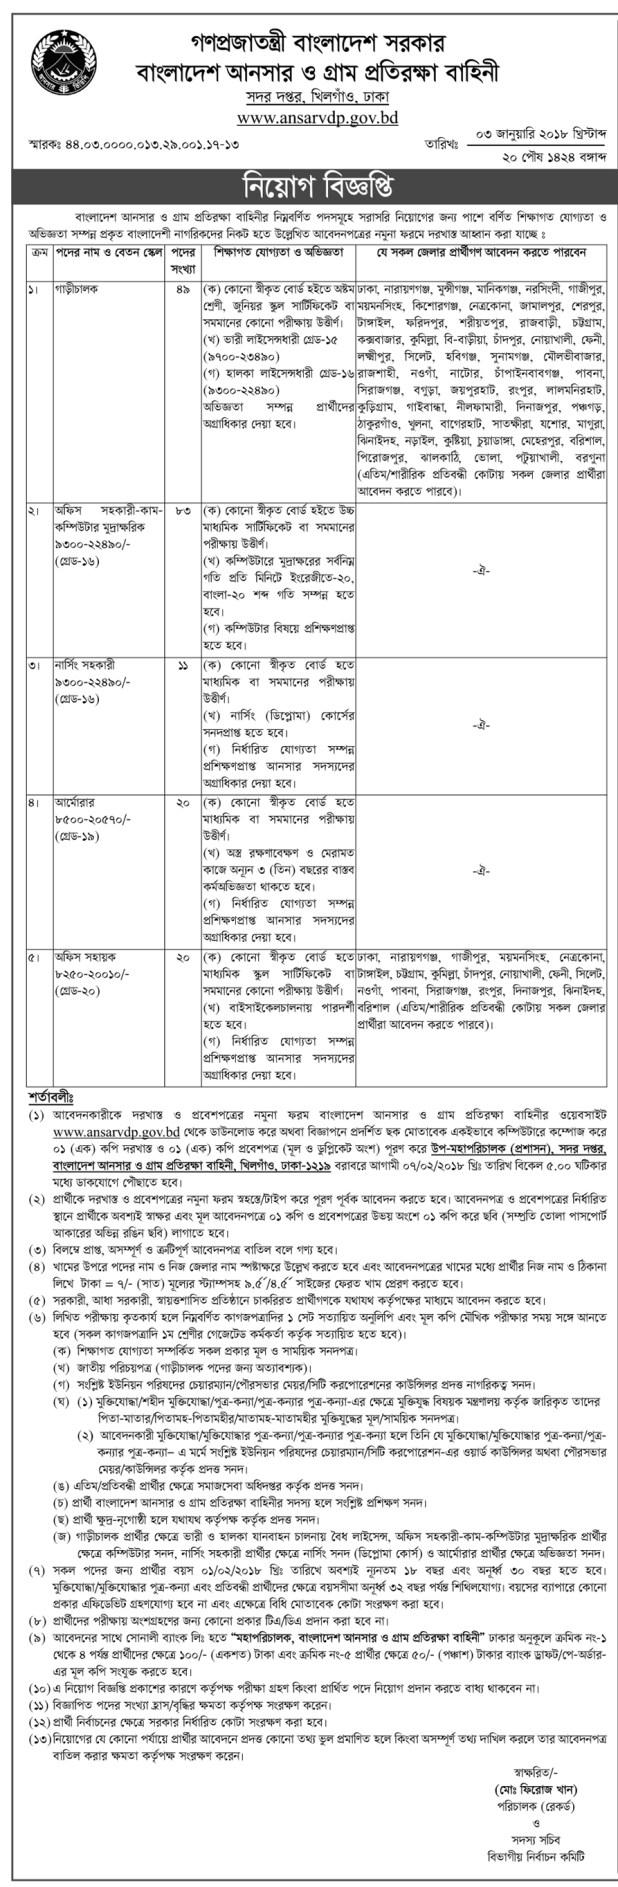 Bd Jobs Govt Jobs in bangladesh Ansar VDP Job Circular 2018